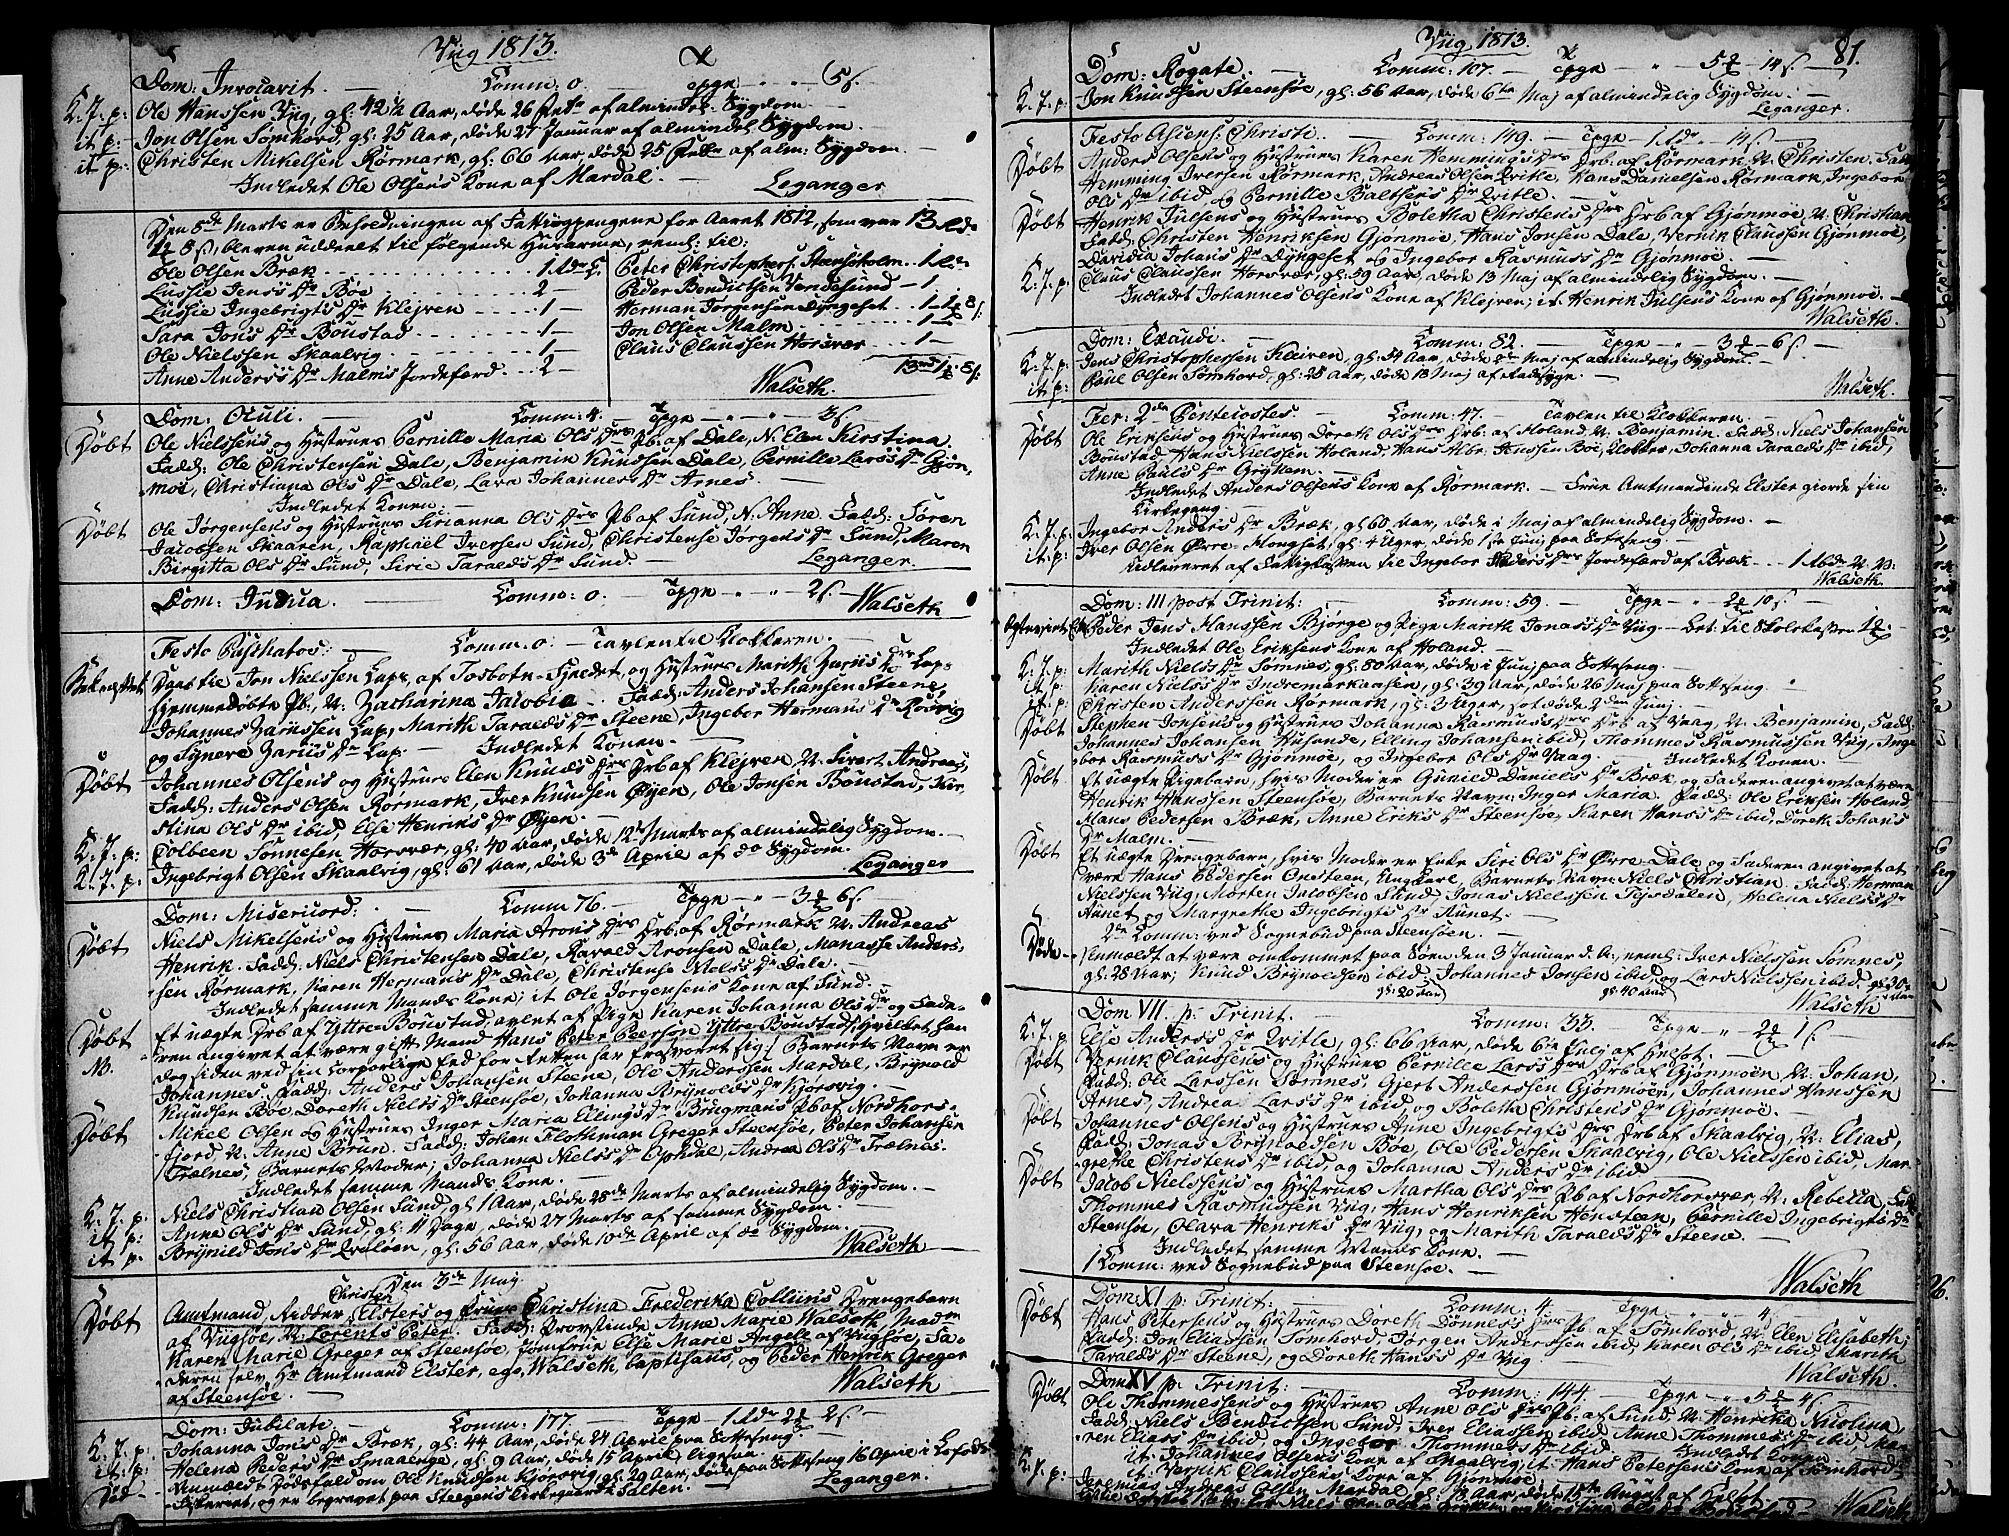 SAT, Ministerialprotokoller, klokkerbøker og fødselsregistre - Nordland, 812/L0174: Ministerialbok nr. 812A03, 1801-1819, s. 81